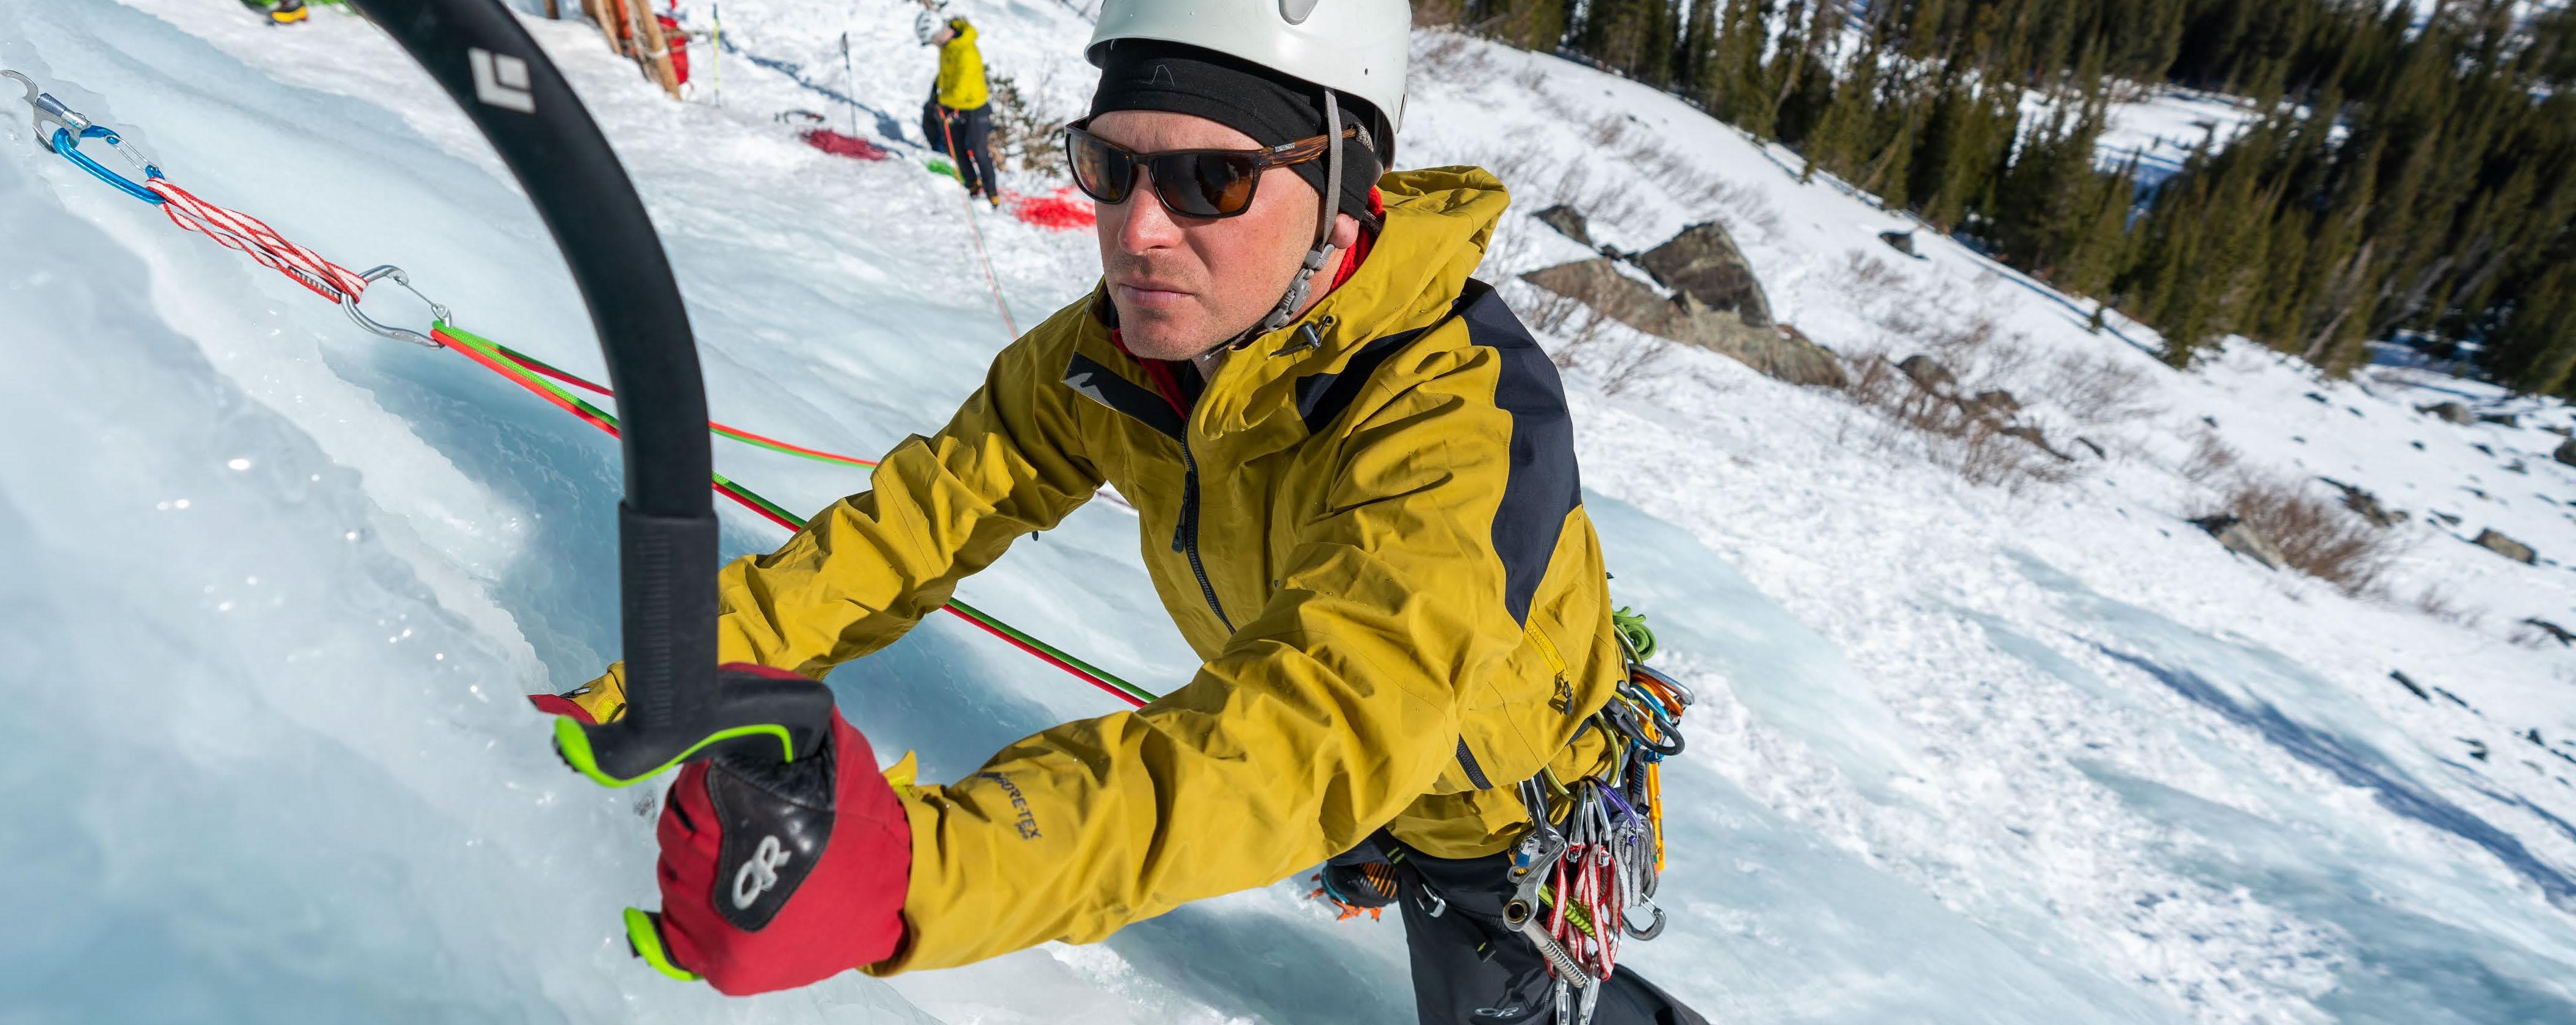 outdoorresearch-archangel-bibs-jacket-review-dirtbagdreams.com